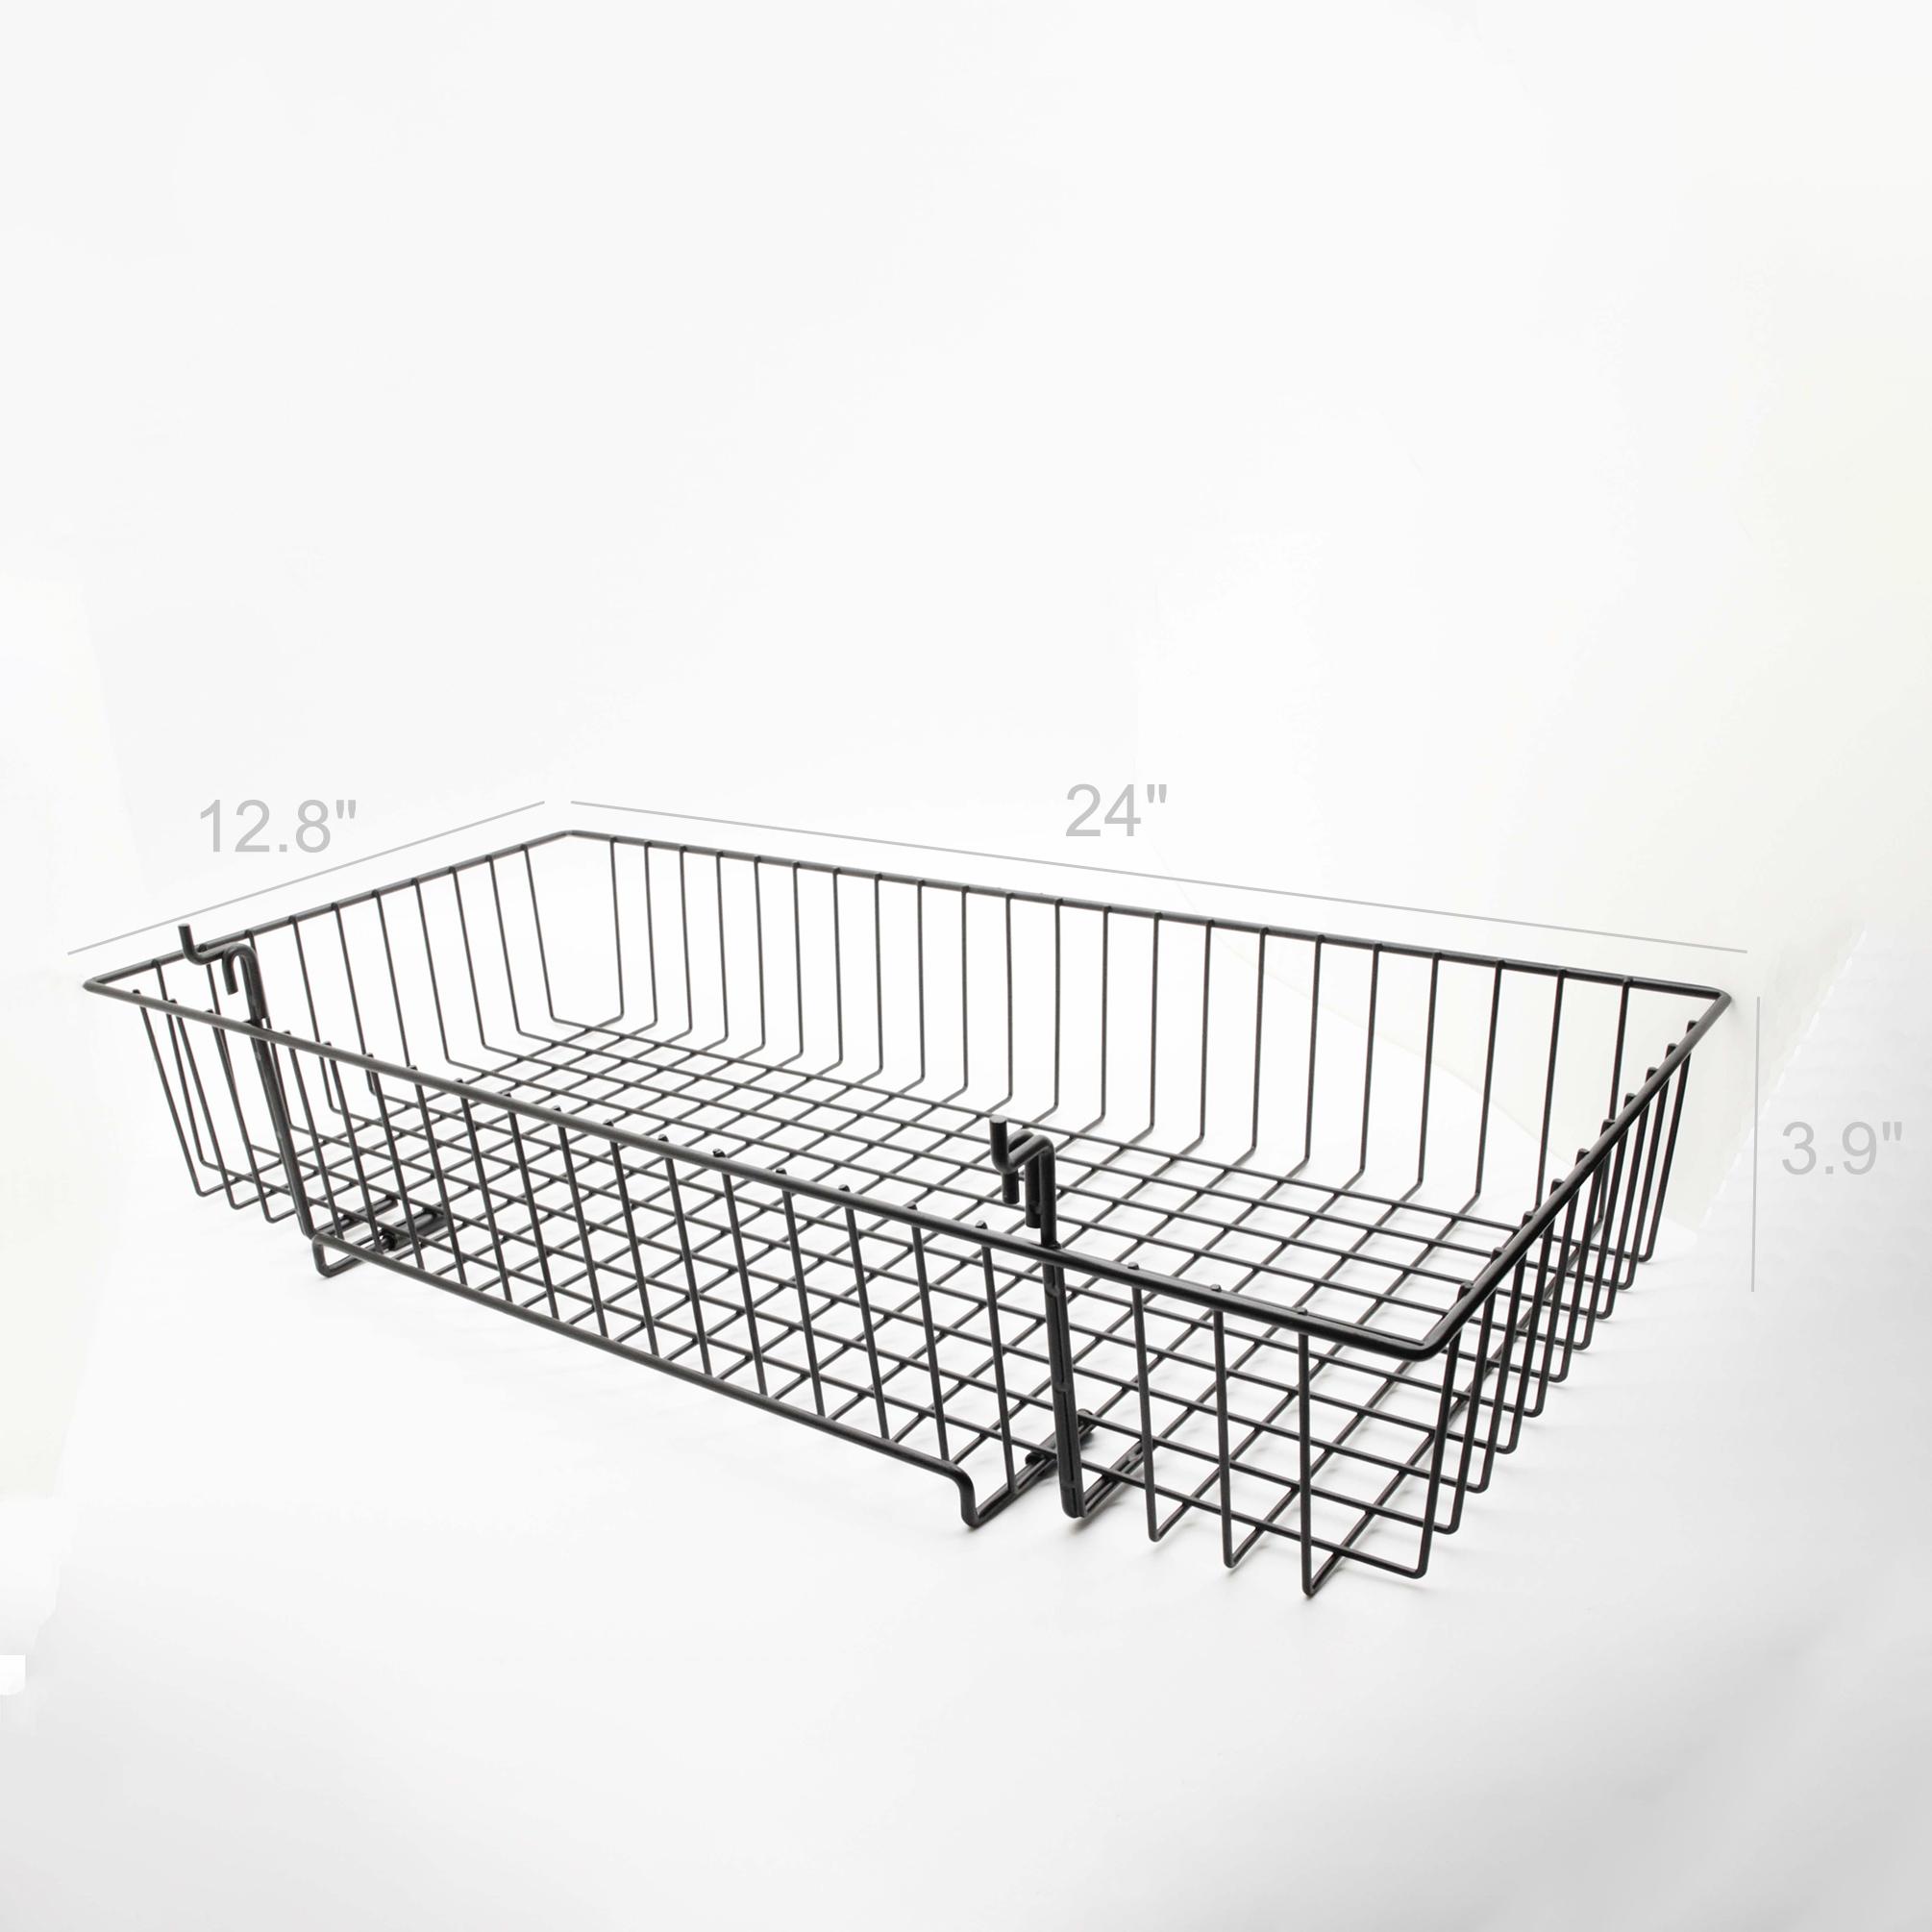 "Metal Grid Wall 24x12"" metal gridwall basket wire holder slatwall hanging basket"